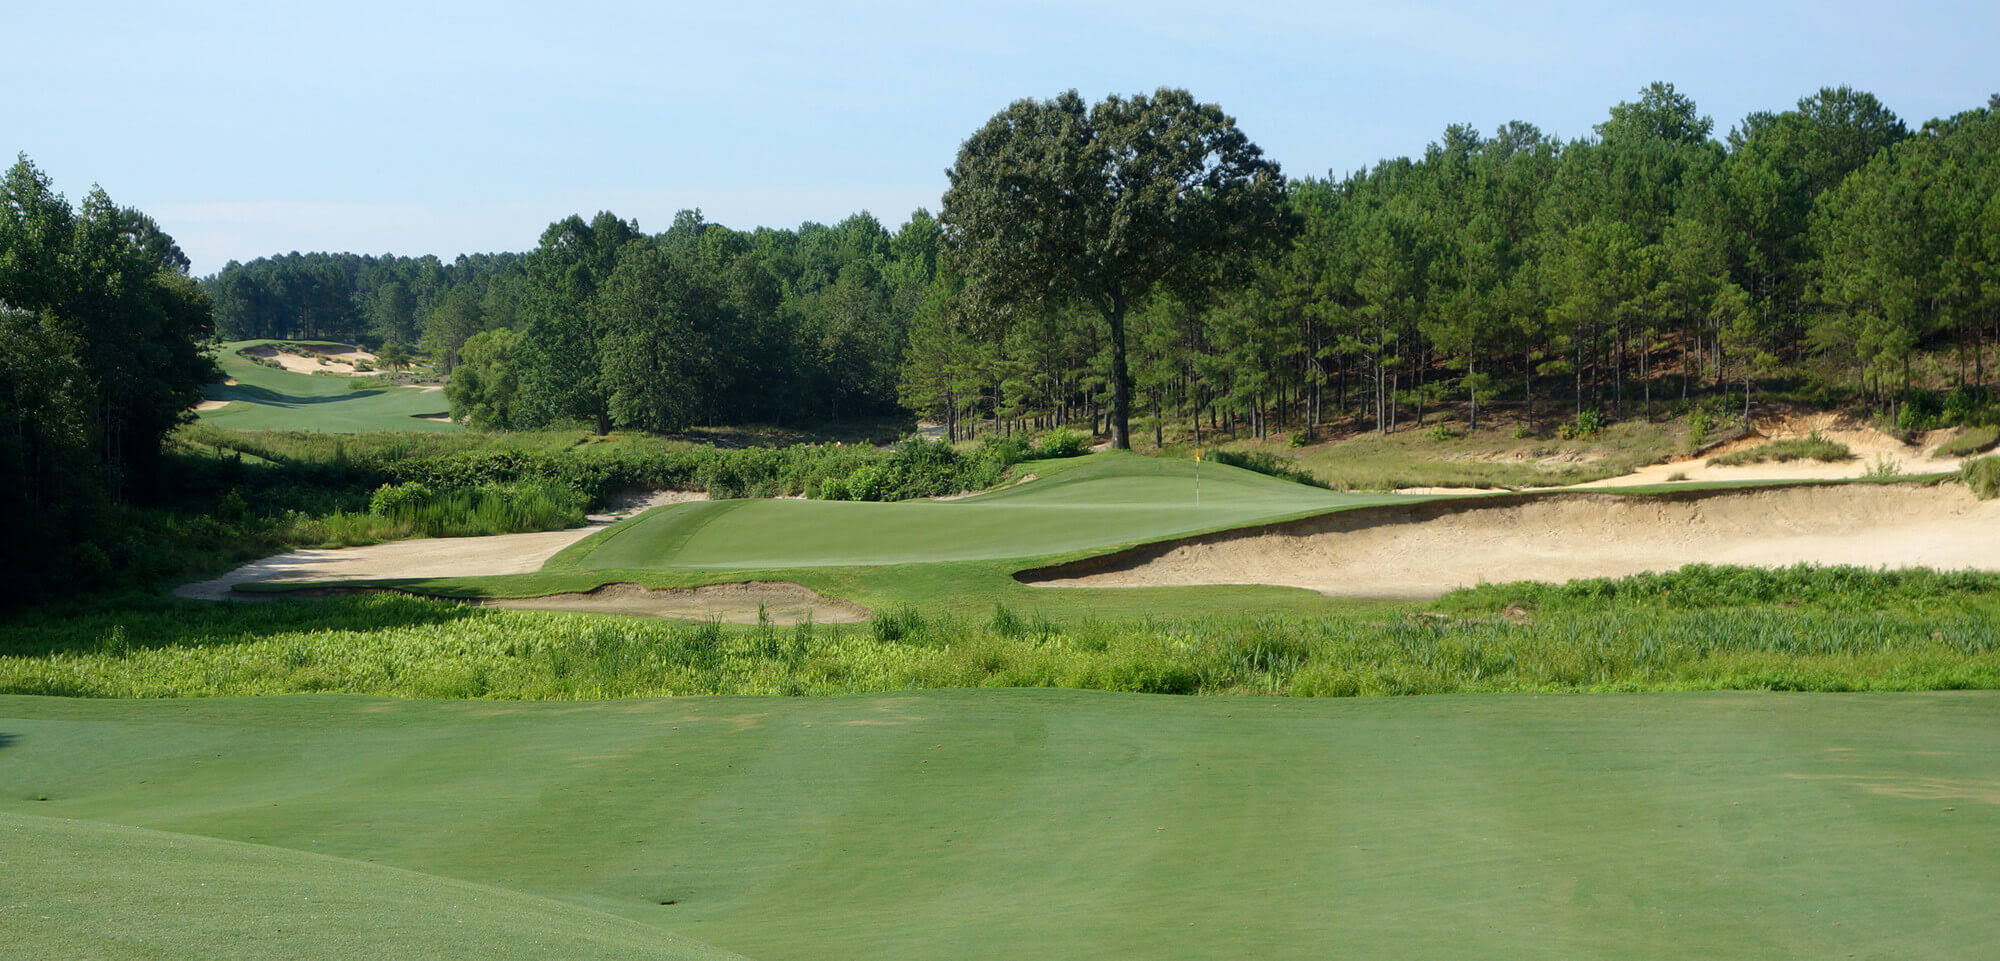 Tobacco Road Golf Club Review - Graylyn Loomis